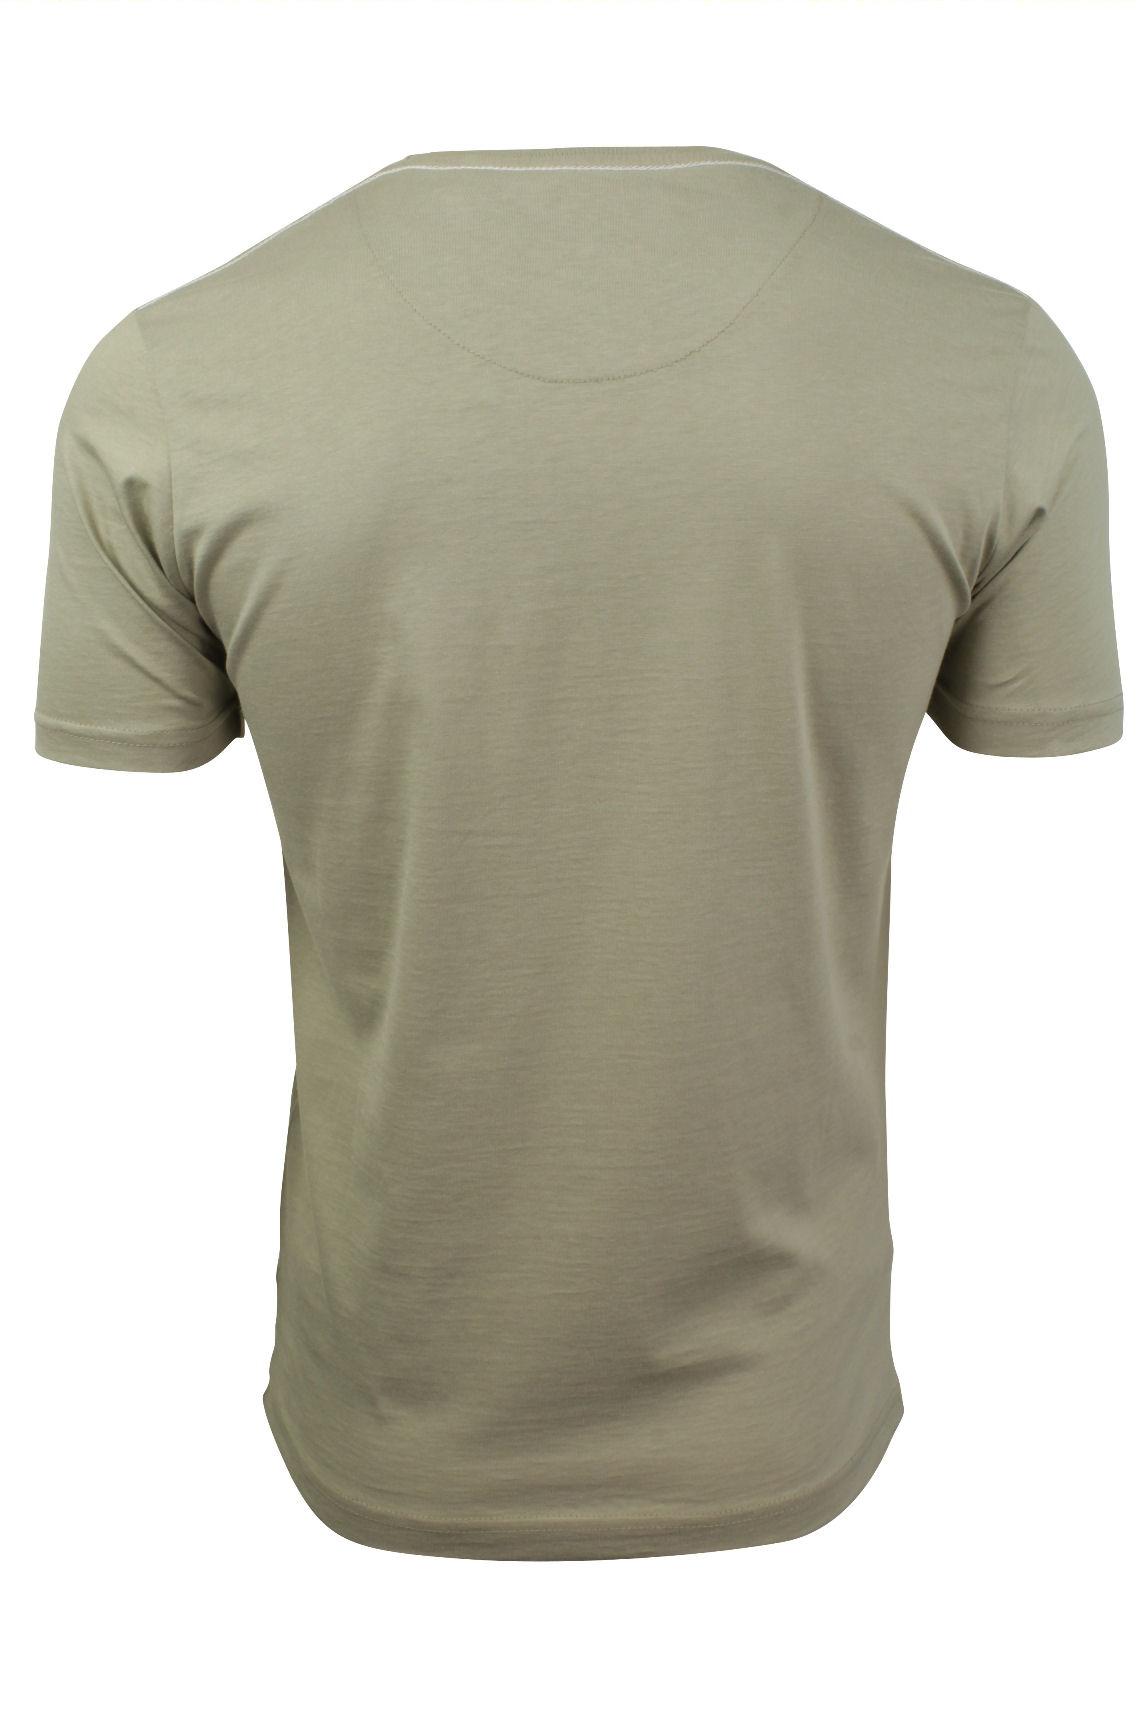 Firetrap-Hombre-Camiseta-de-manga-corta-039-Towson-039 miniatura 11